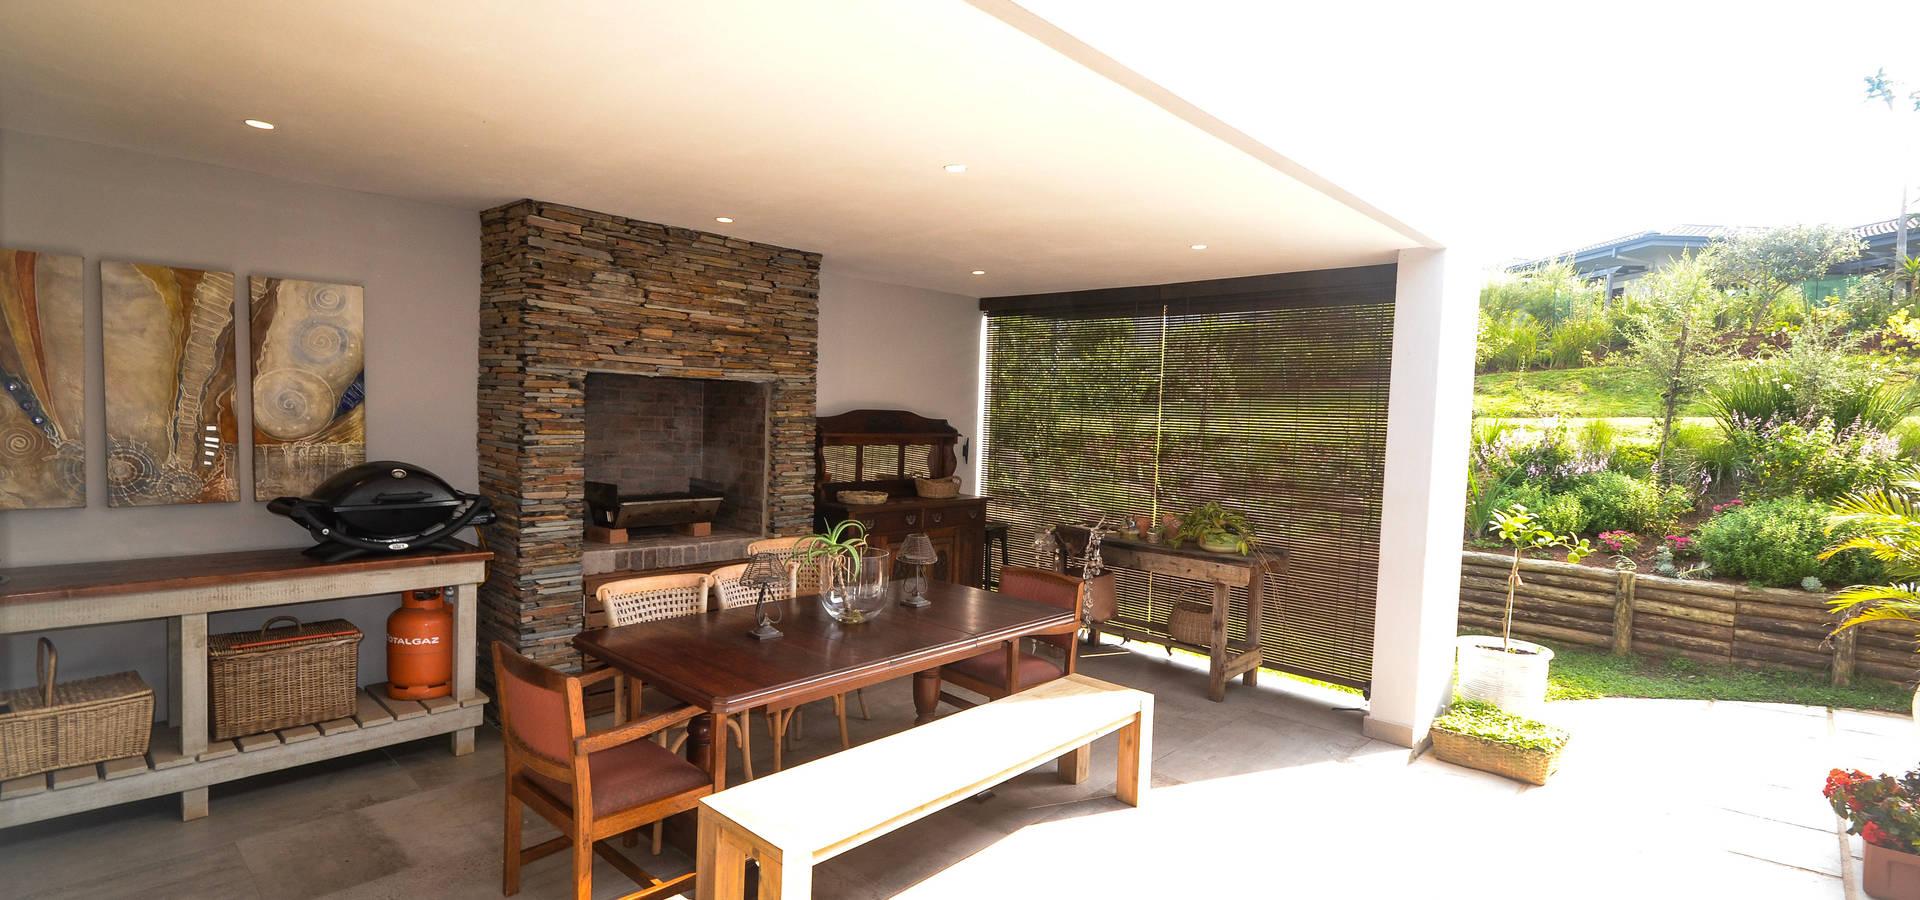 Tiaan Botha Architecture & Associates